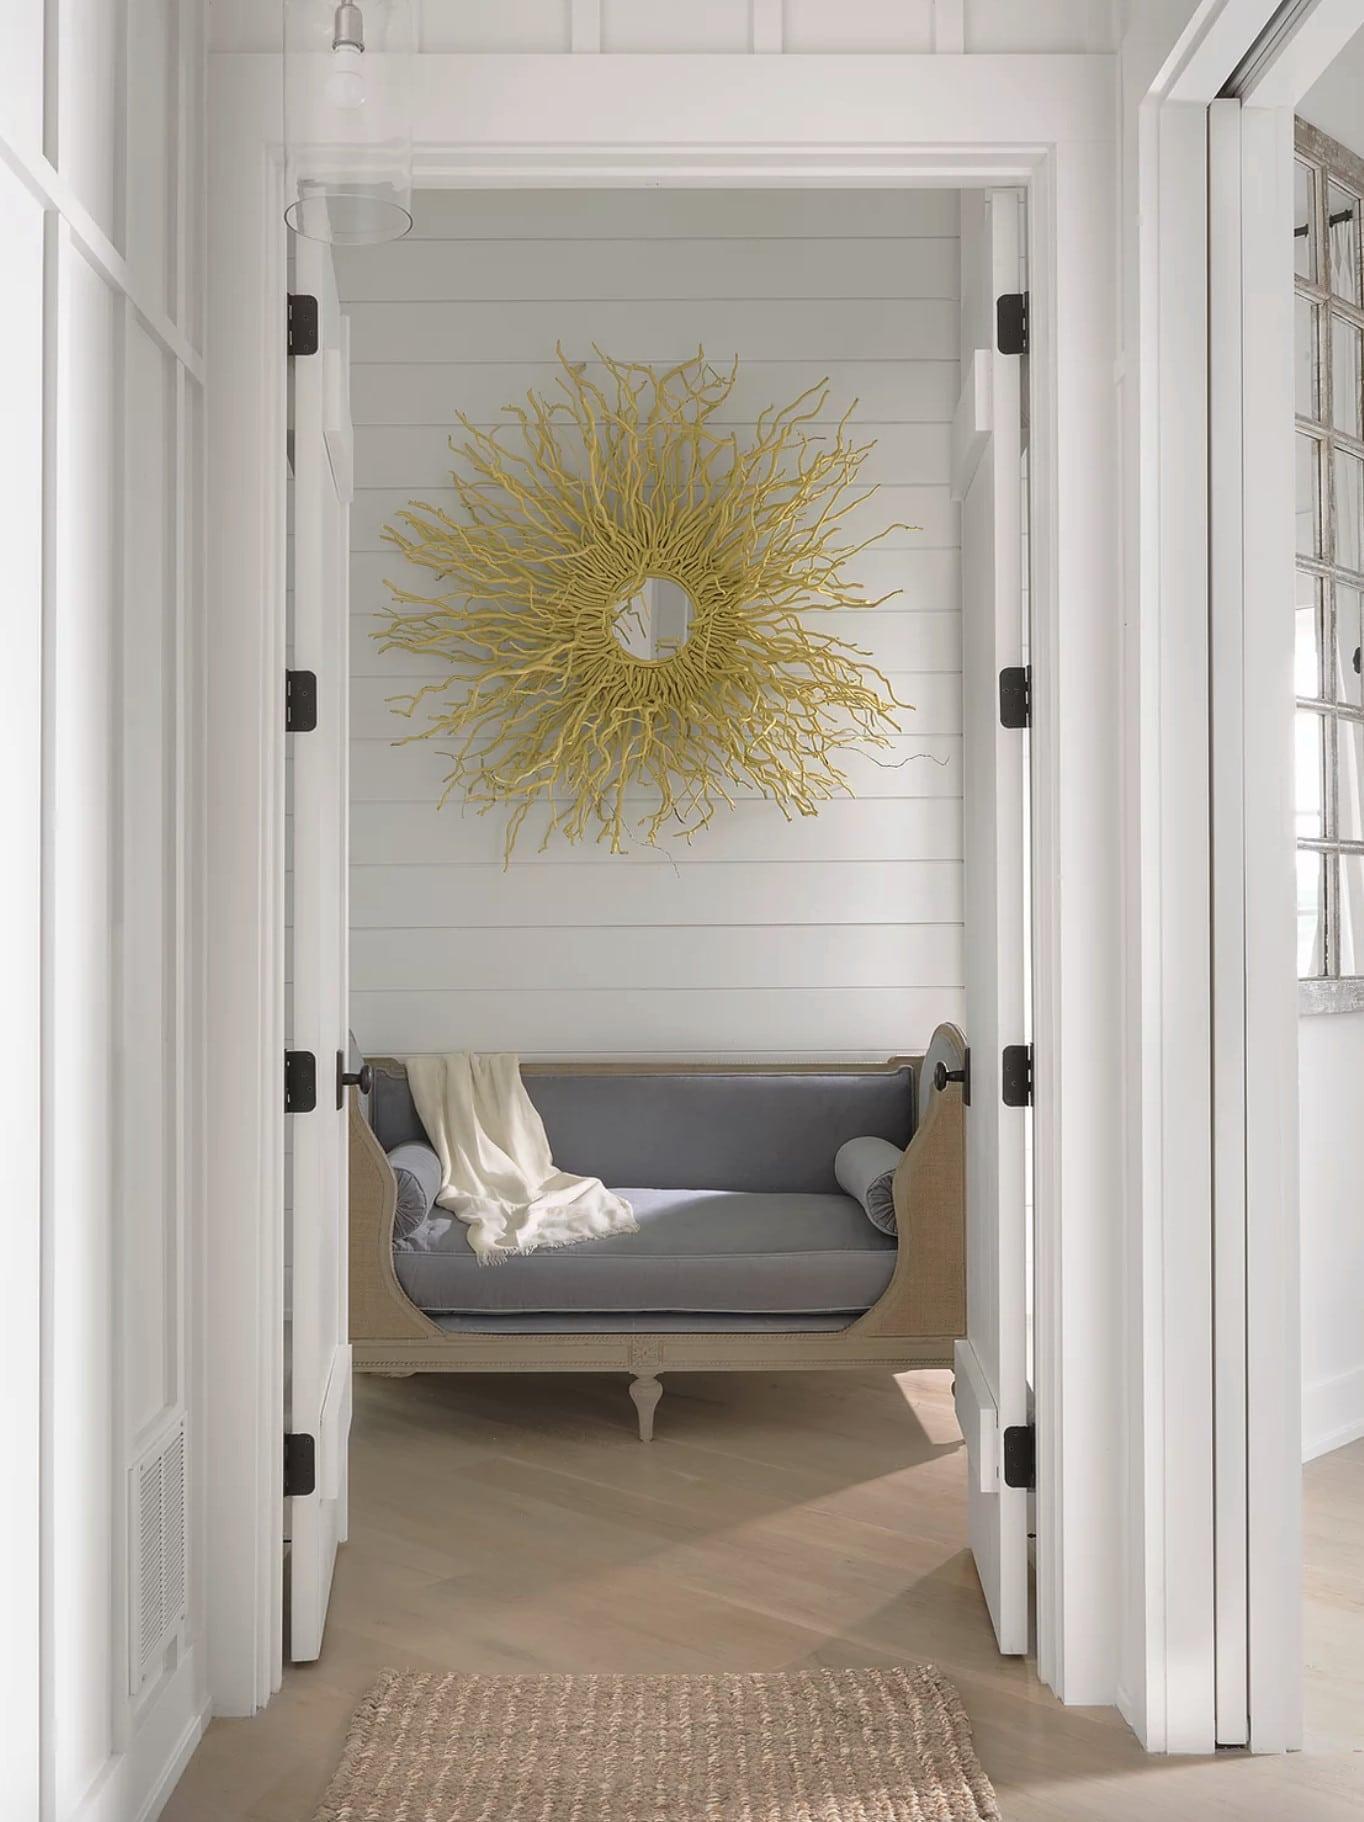 Nantucket house tour by Amy Studebaker Interior Design - Alise O'Brien Photography